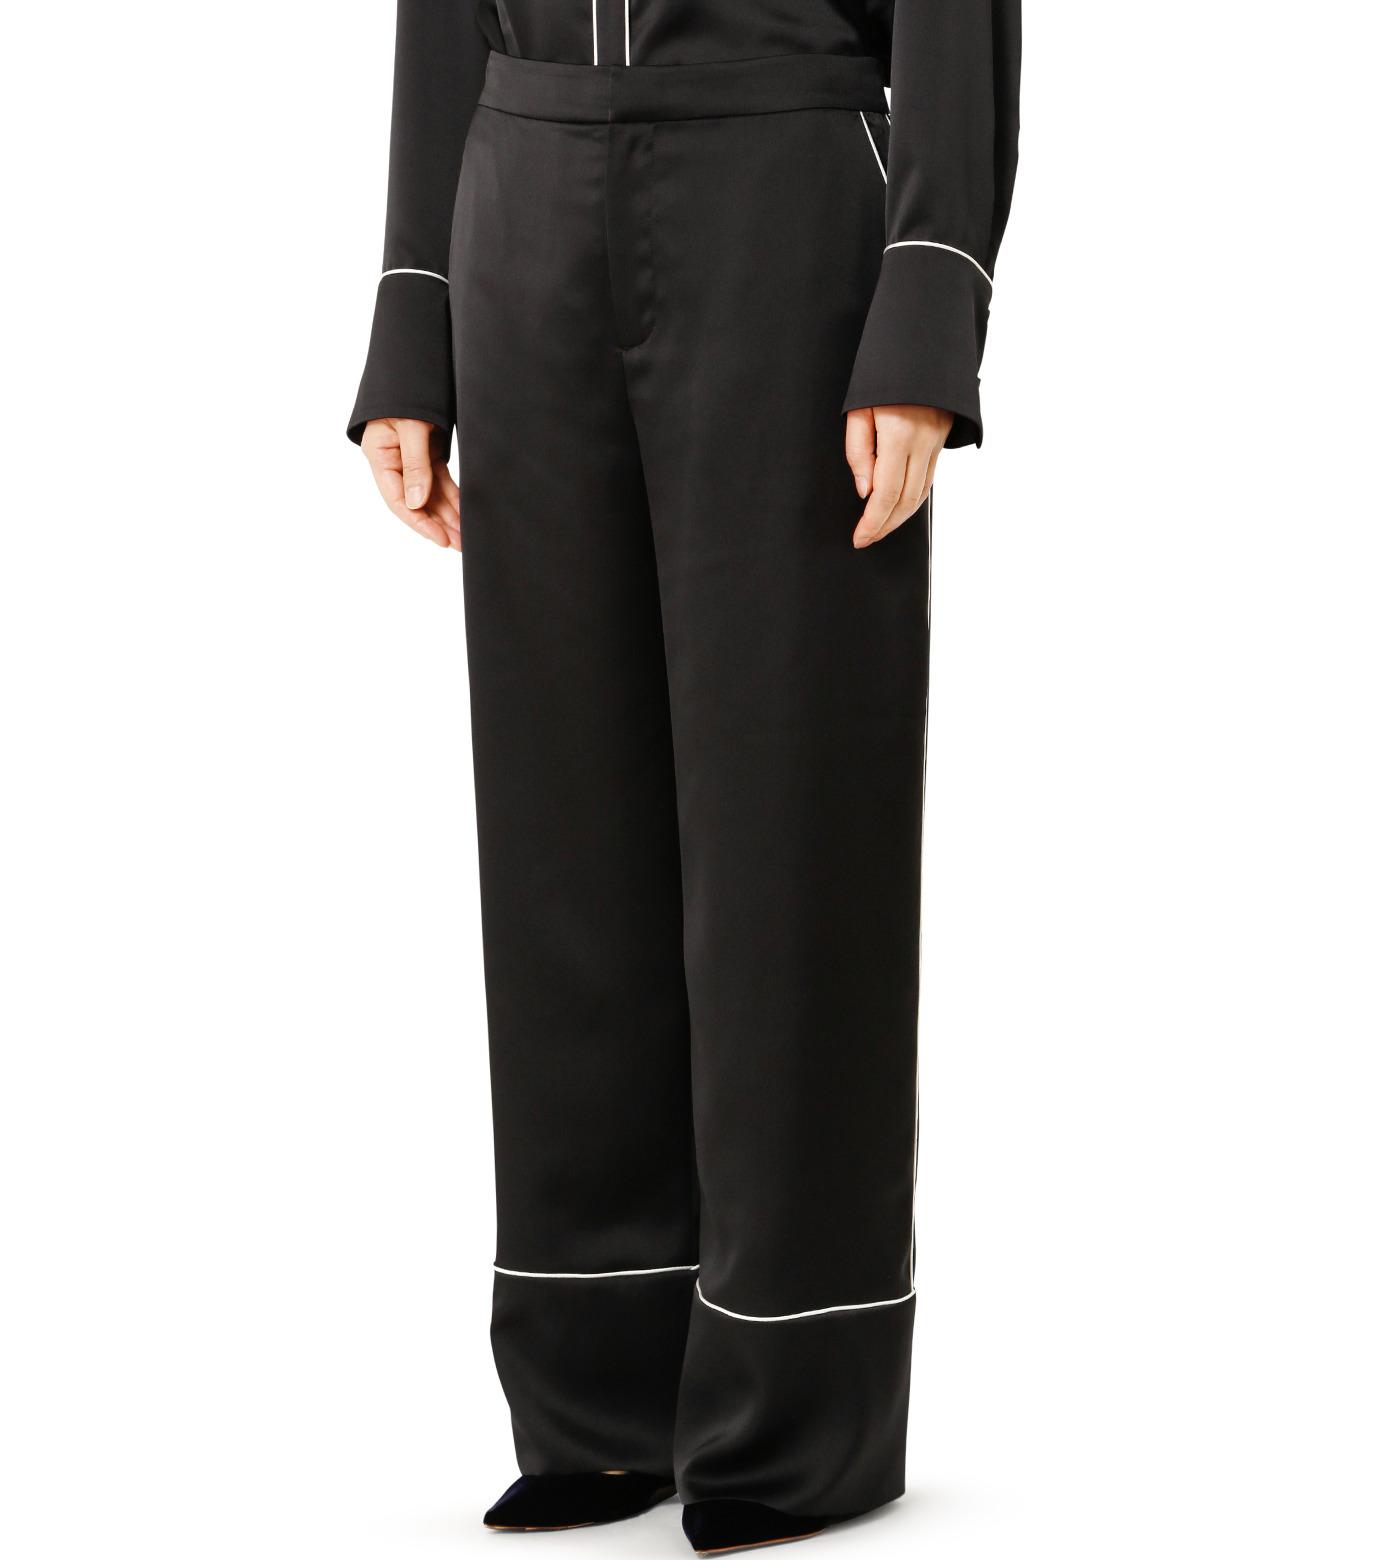 LE CIEL BLEU(ルシェルブルー)のパジャマルックパンツ-BLACK(パンツ/pants)-19S68101 拡大詳細画像3